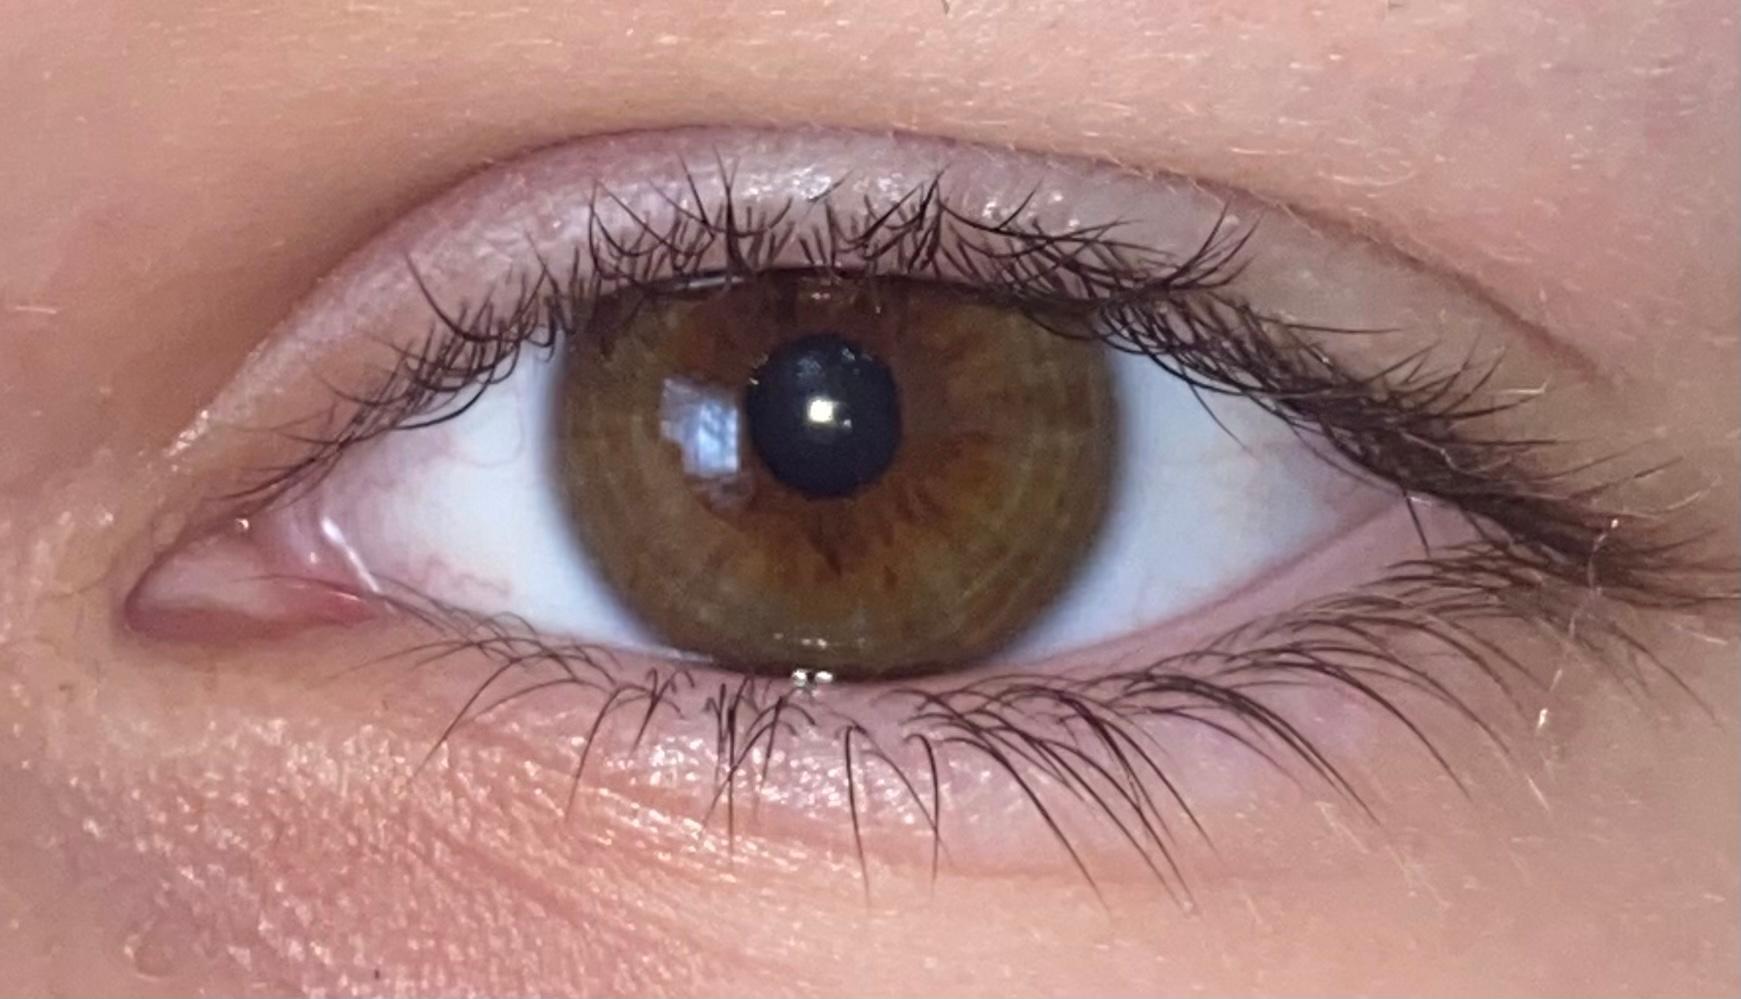 Welche Augenfarbe hab ich genau? (Biologie, Farbe, eyes)